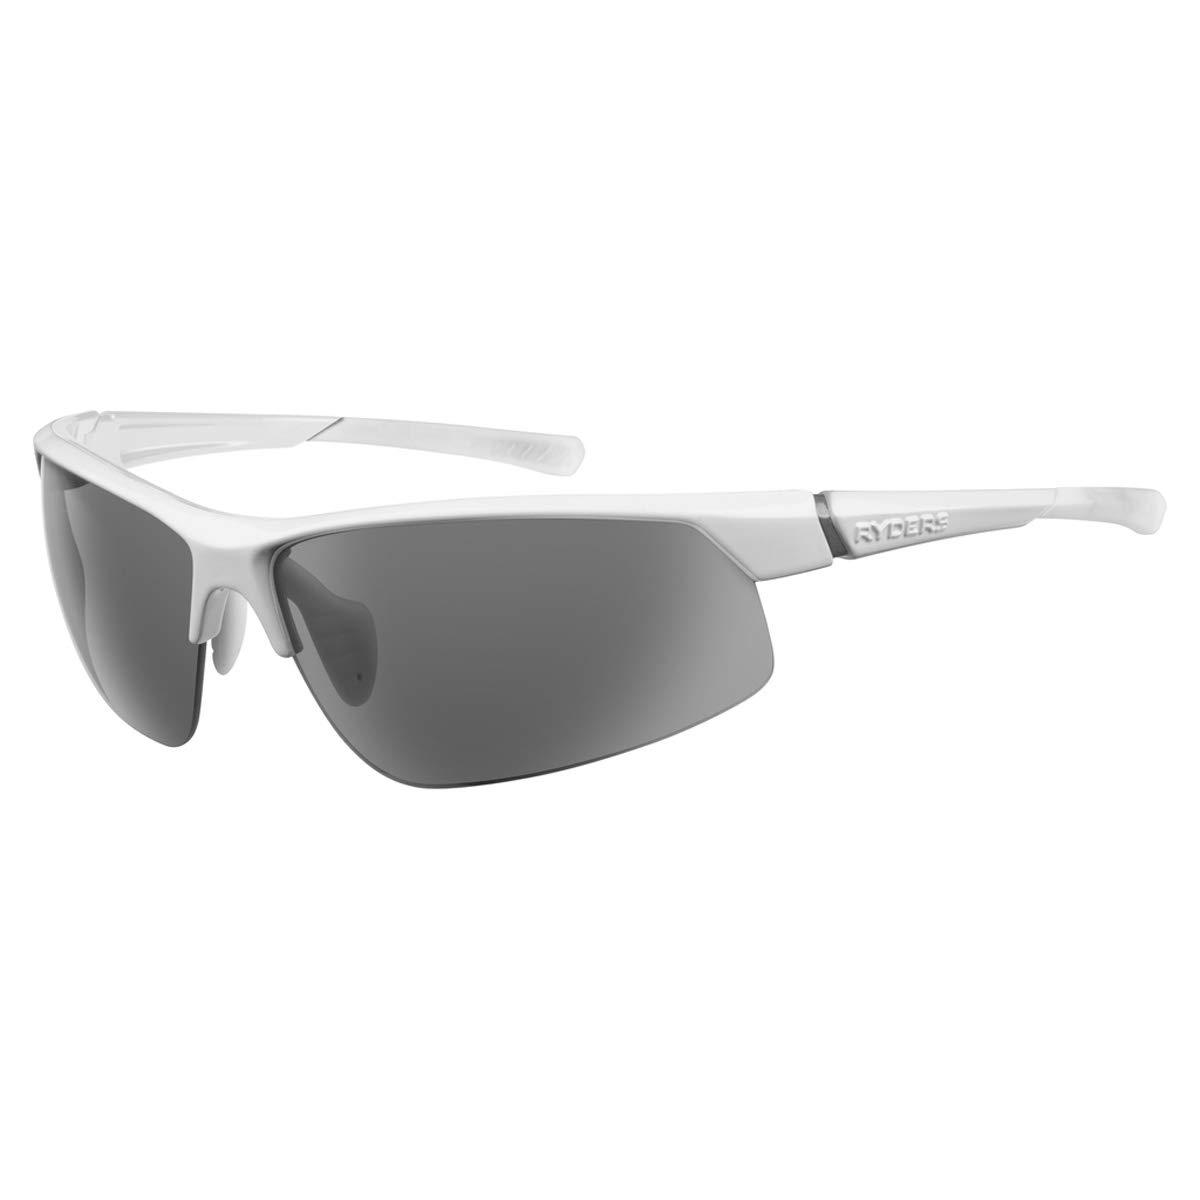 Ryders Saber Polar Polarized Wrap Sunglasses Ryders Eyewear R07504A